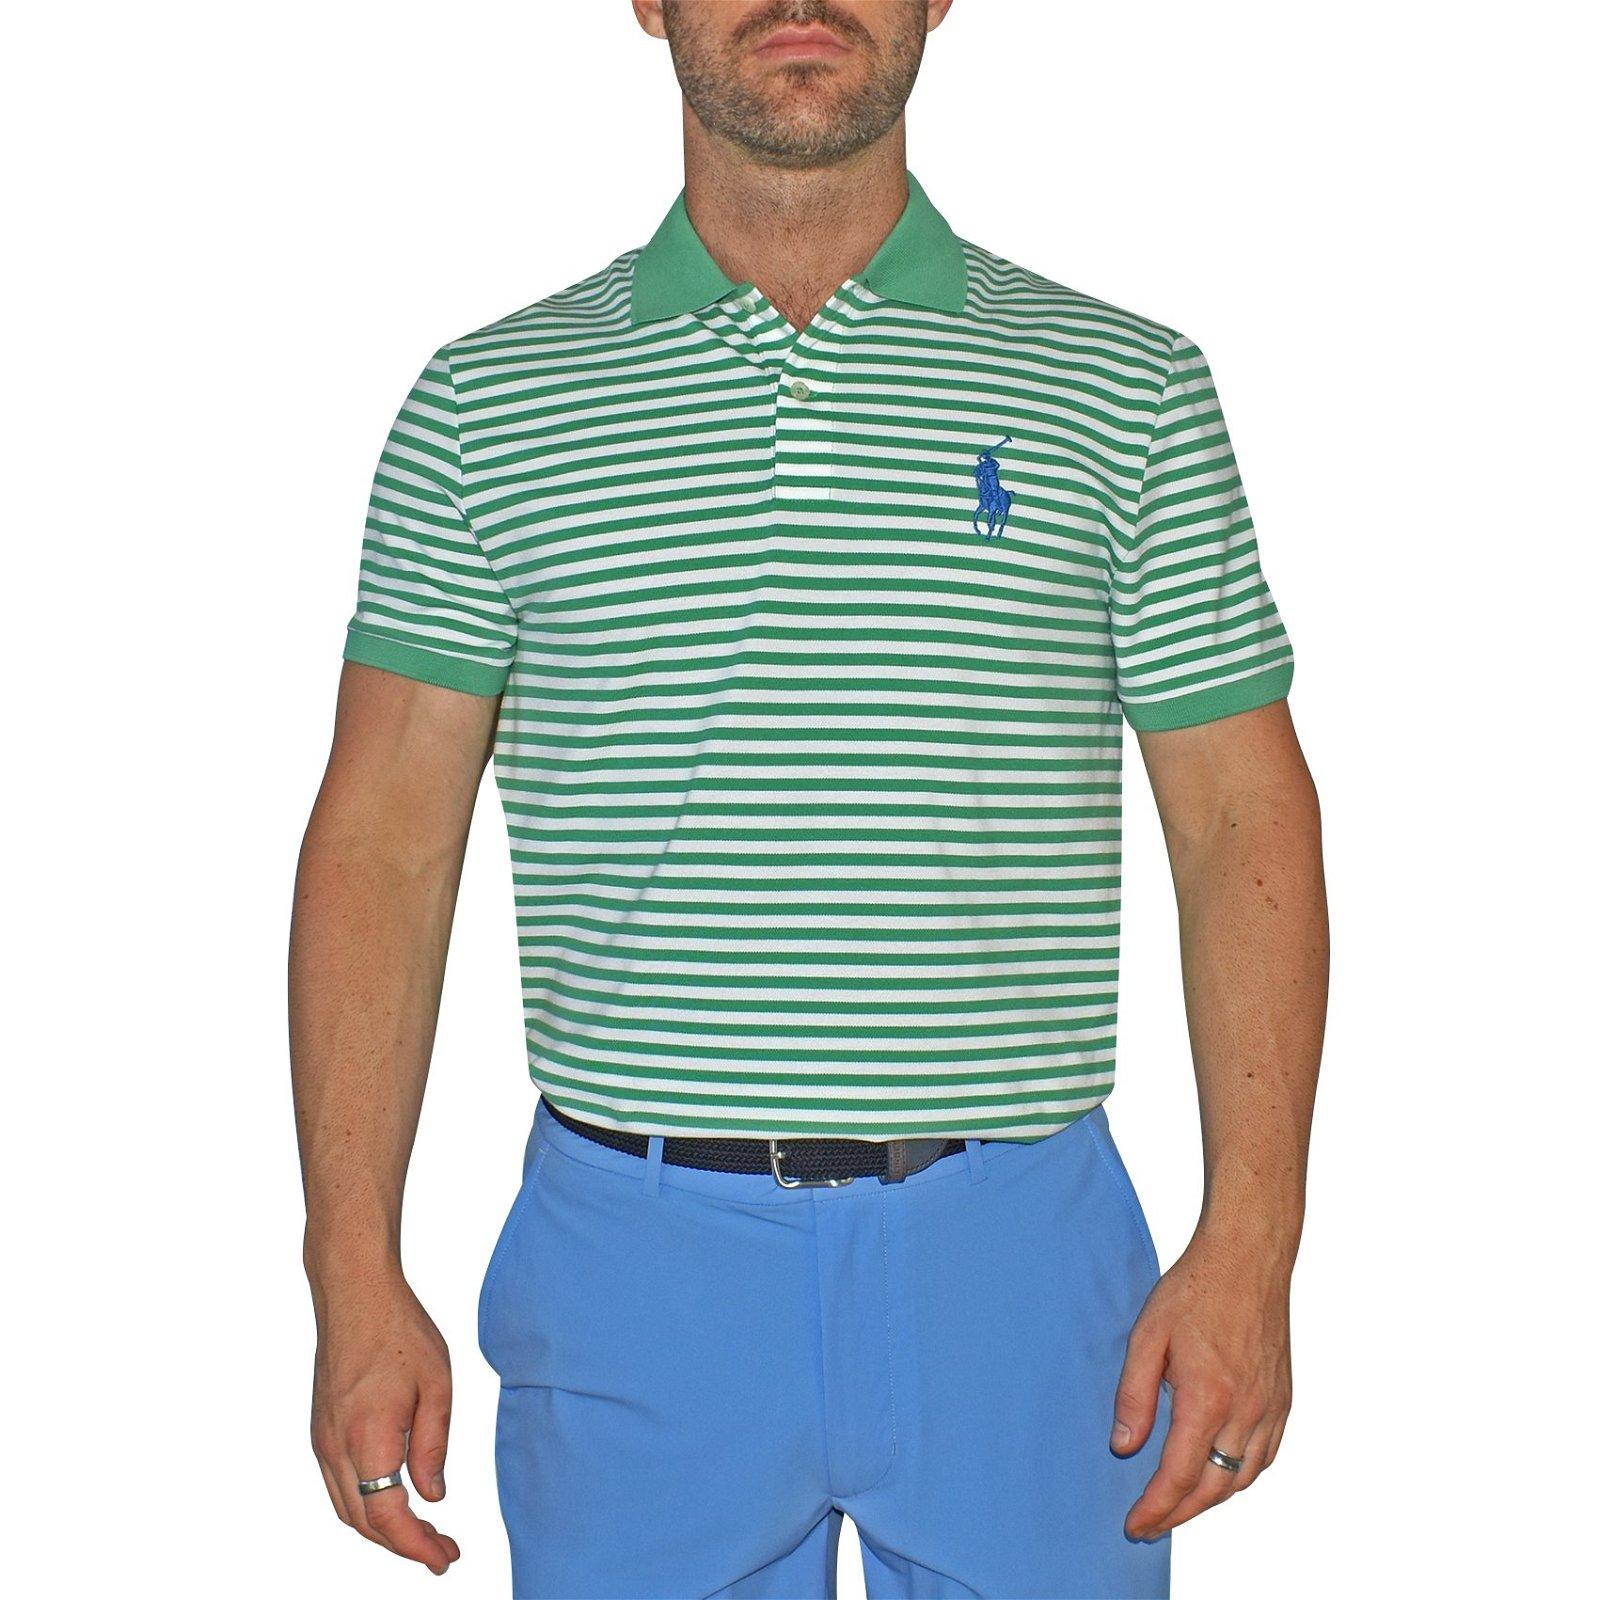 b2dfbba2 Image of Polo Golf Ralph Lauren Performance Pique Polo Shirt - Green Stripe